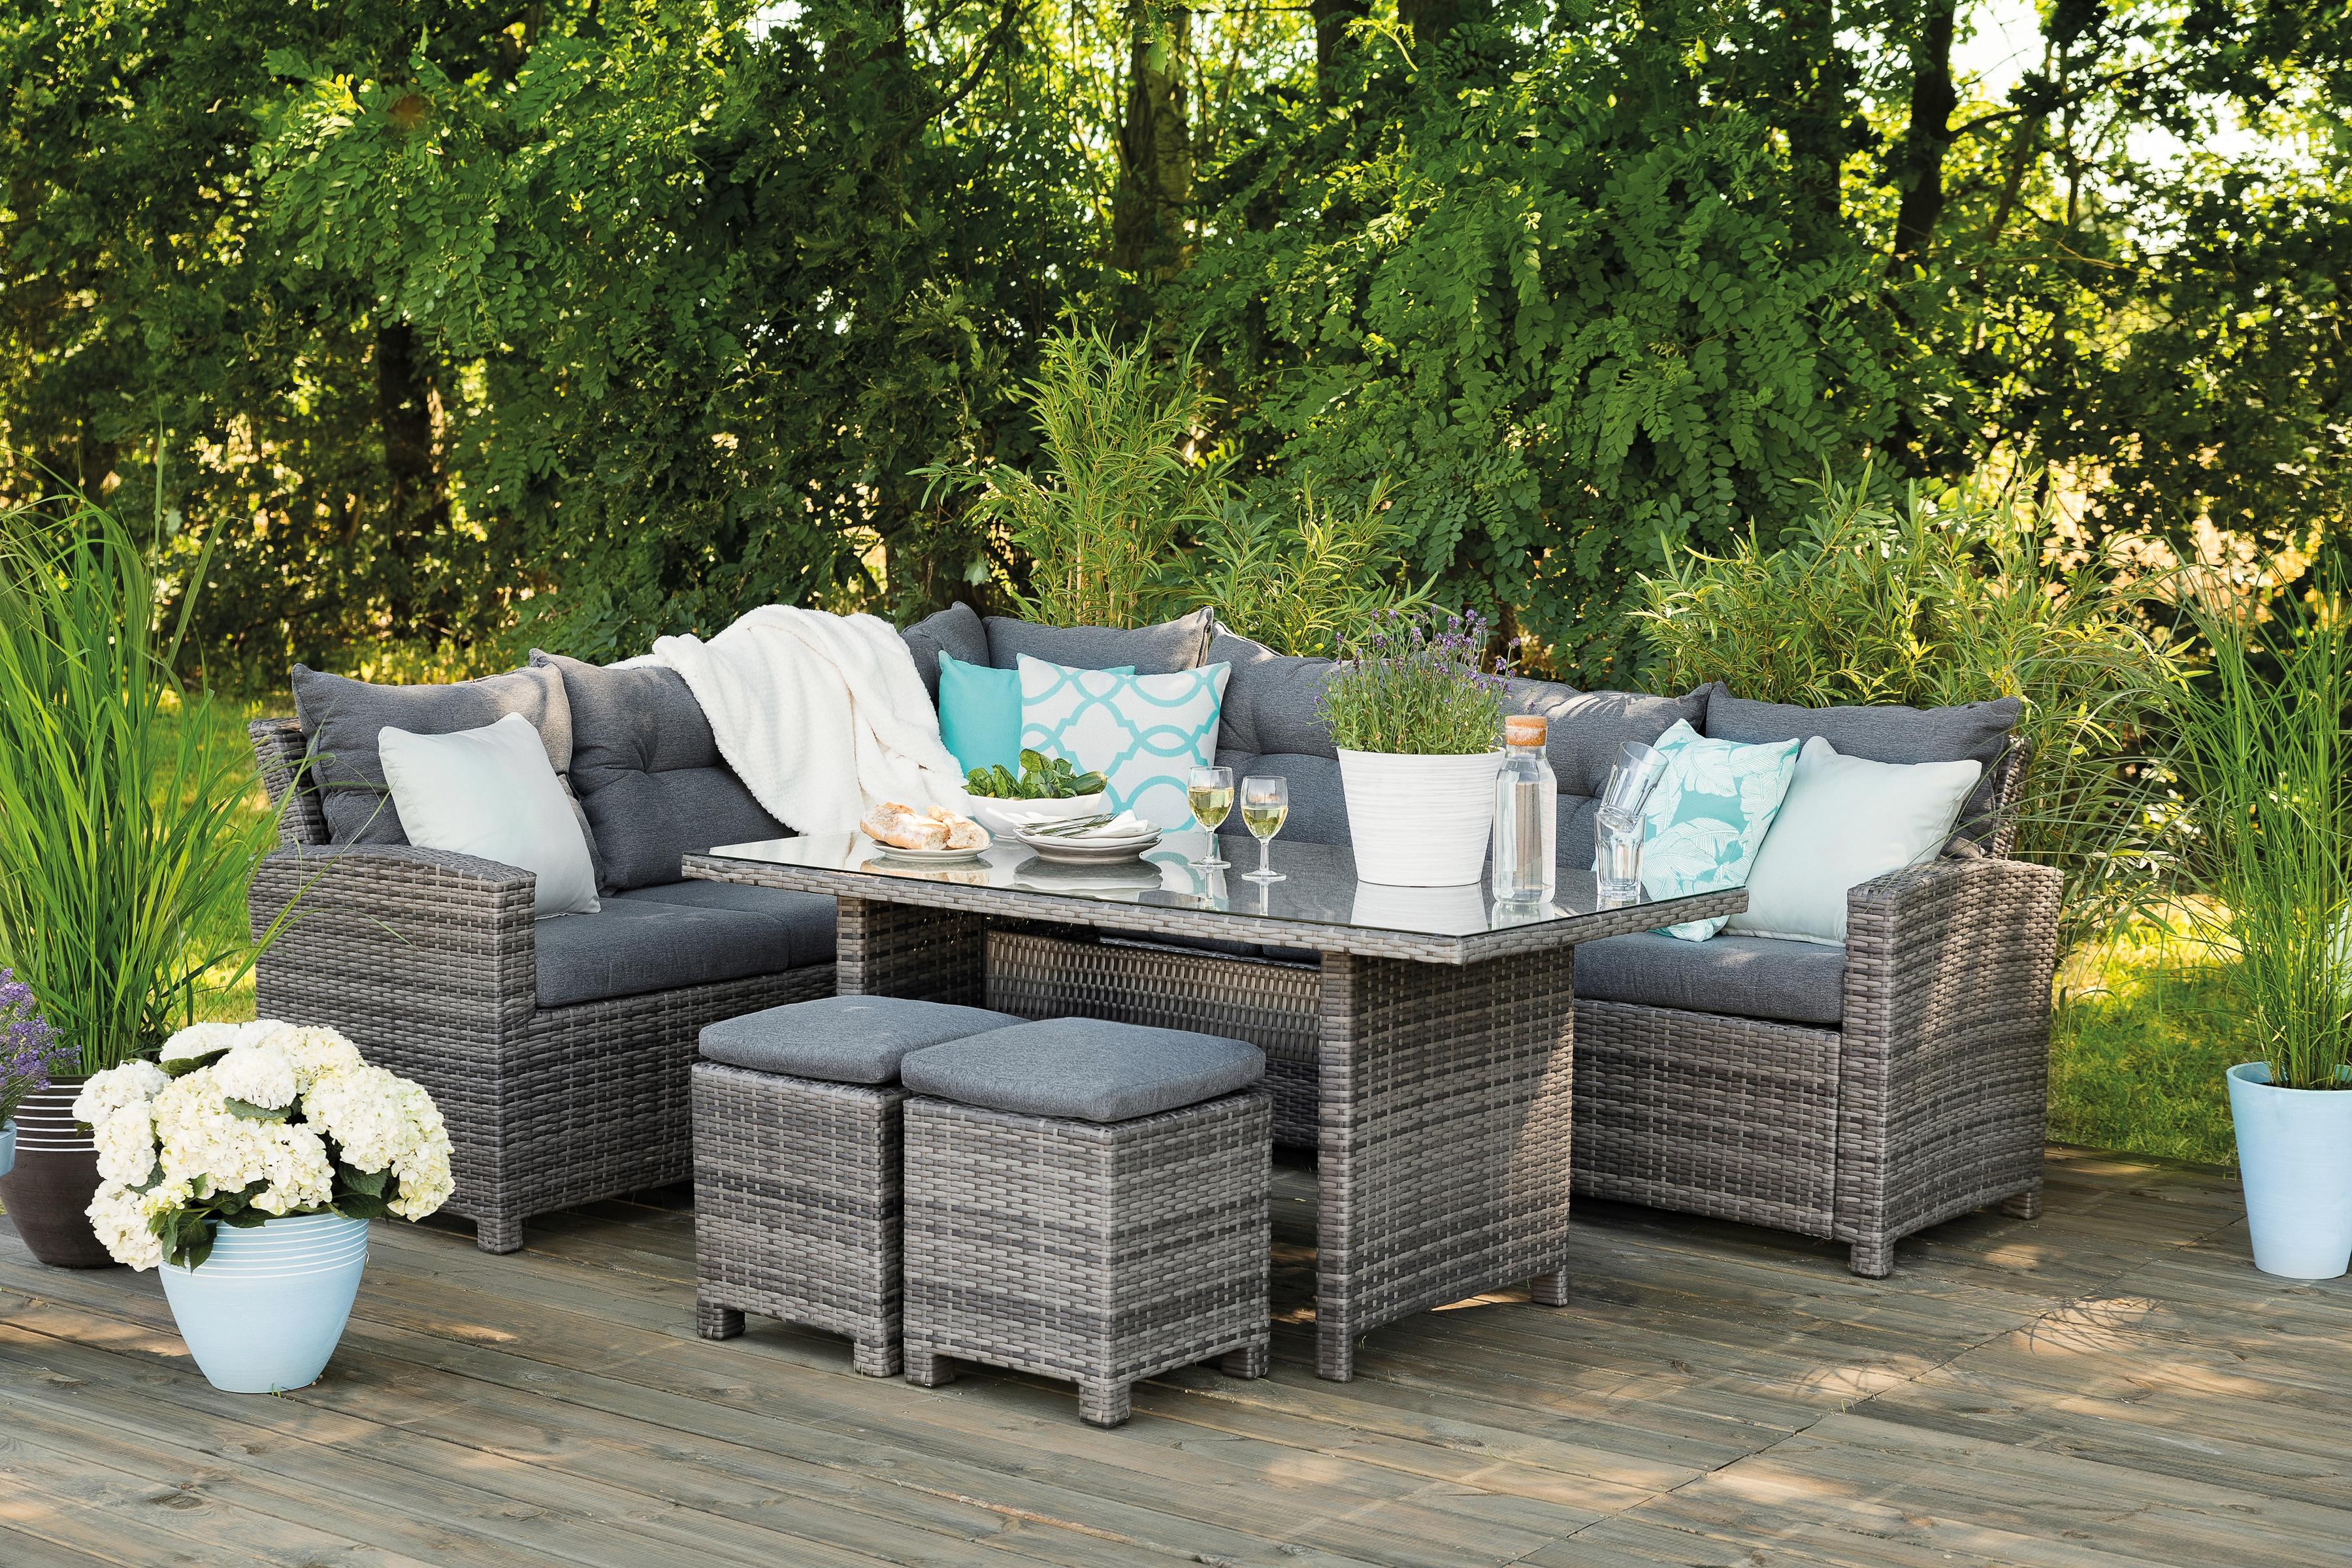 GREEMOTION Loungeset Tessin 20-tlg 2 Sofa 2 Sessel Tisch 150x80 cm Kunststoff grau